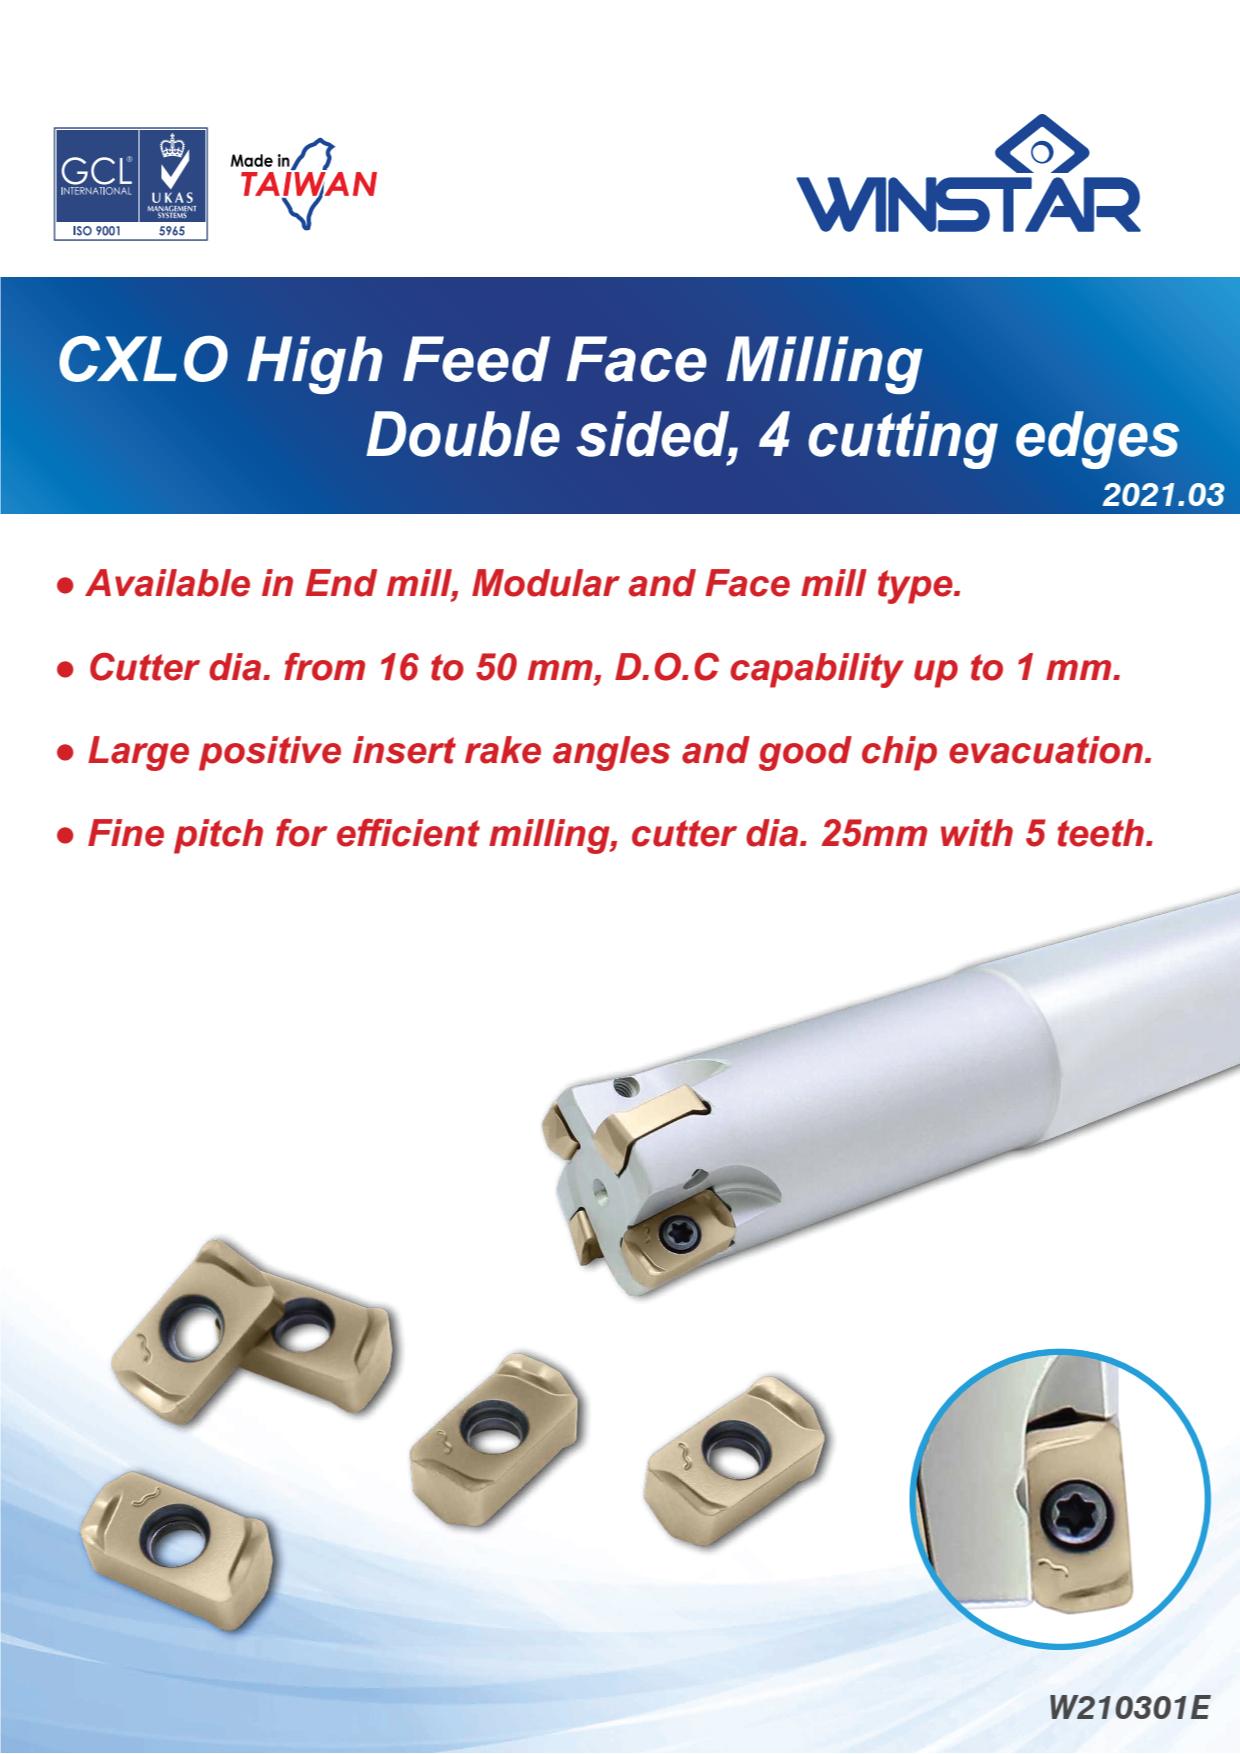 Dao Phay Gắn Mảnh High Feed Face Milling Winstar CXLO 1